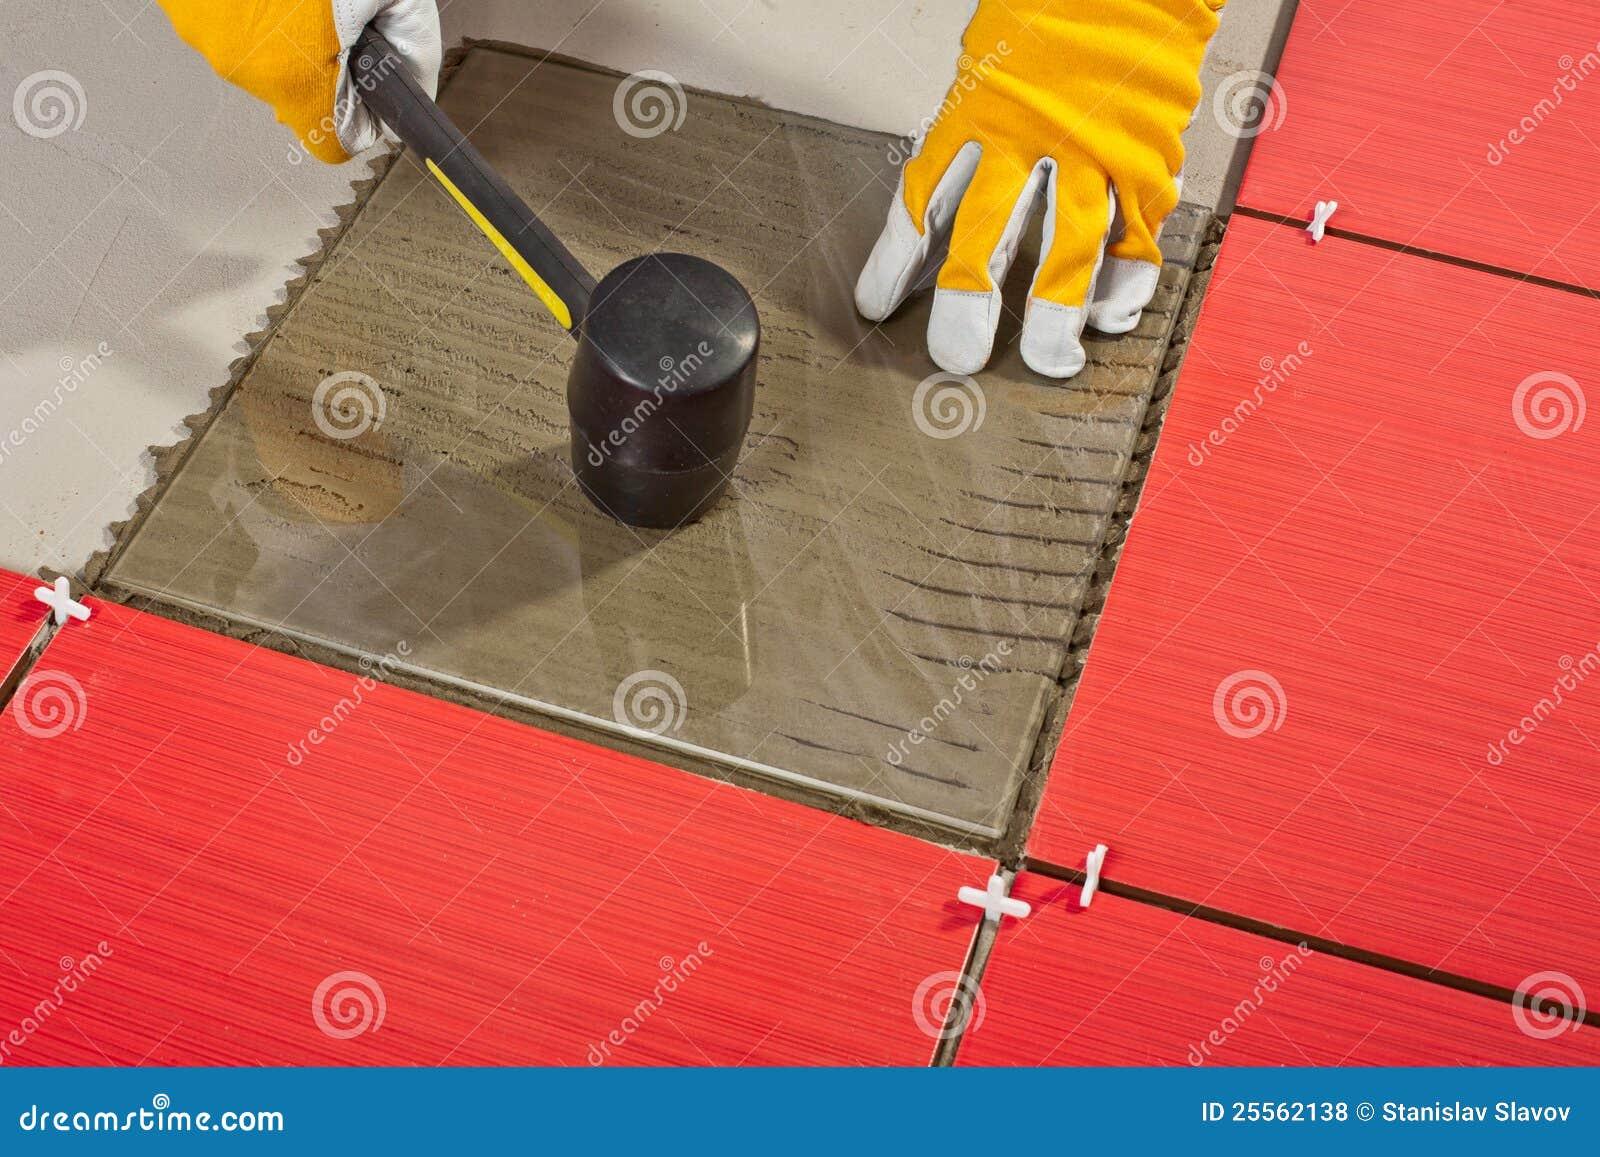 Rubber Hammer Install Glass Tiles Royalty Free Stock